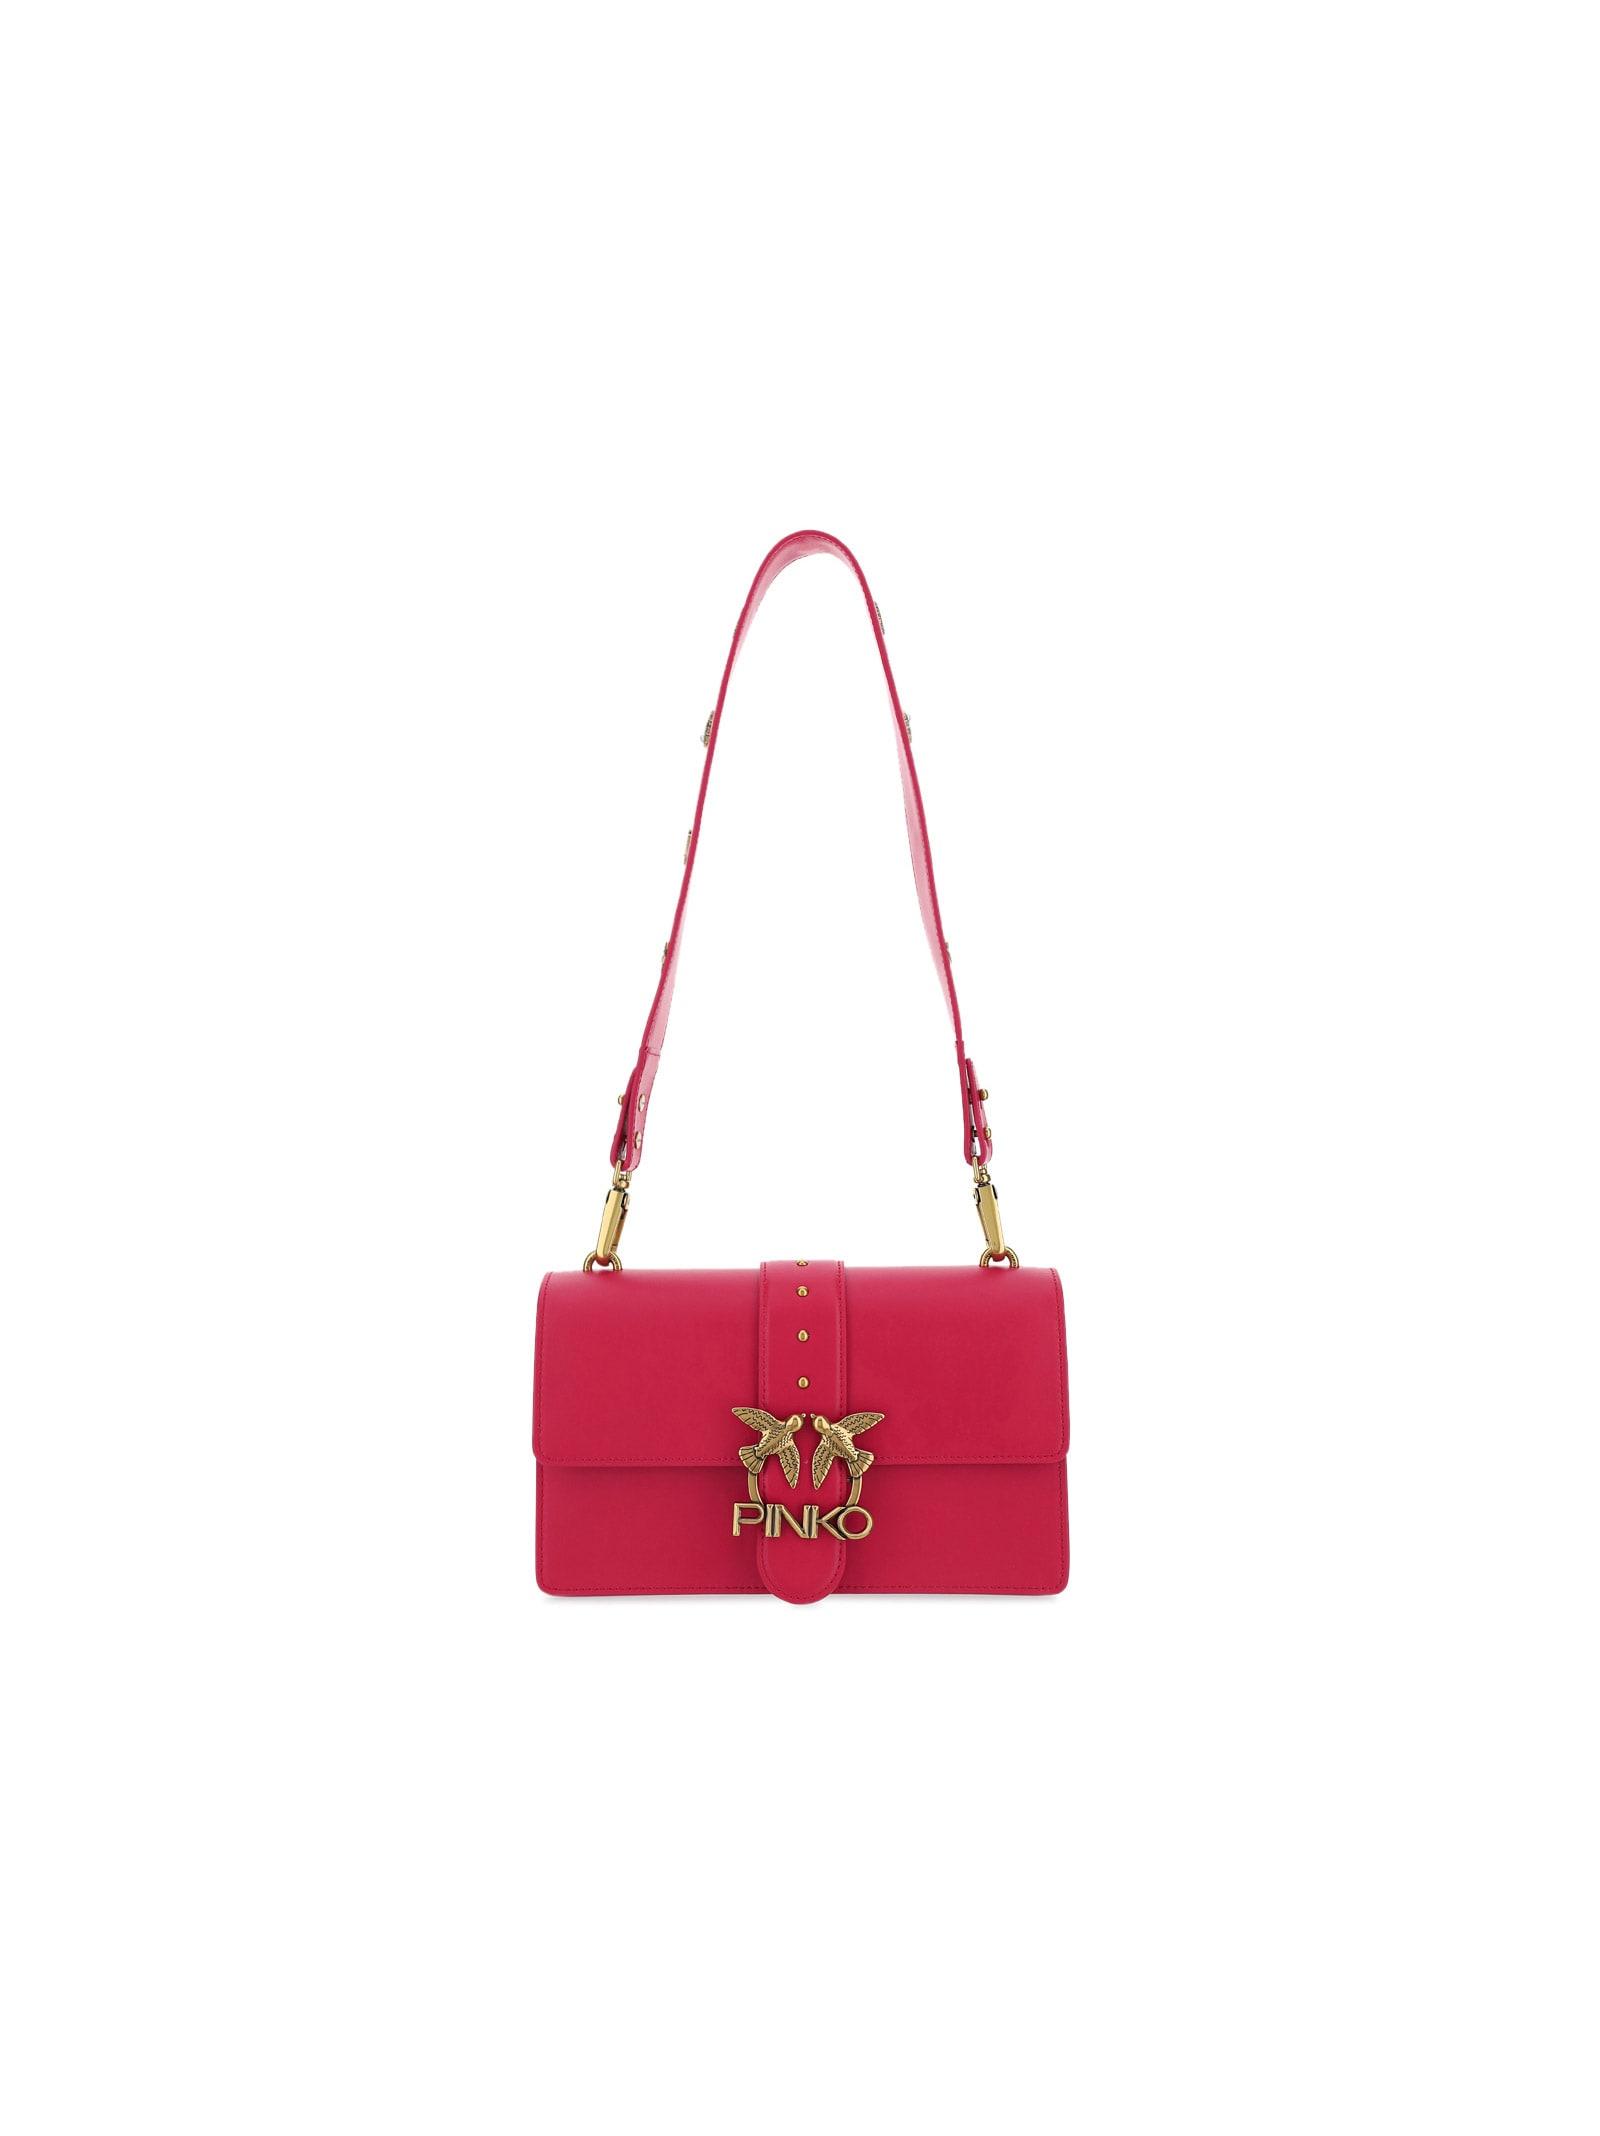 Pinko LOVE CLASSIC BAG